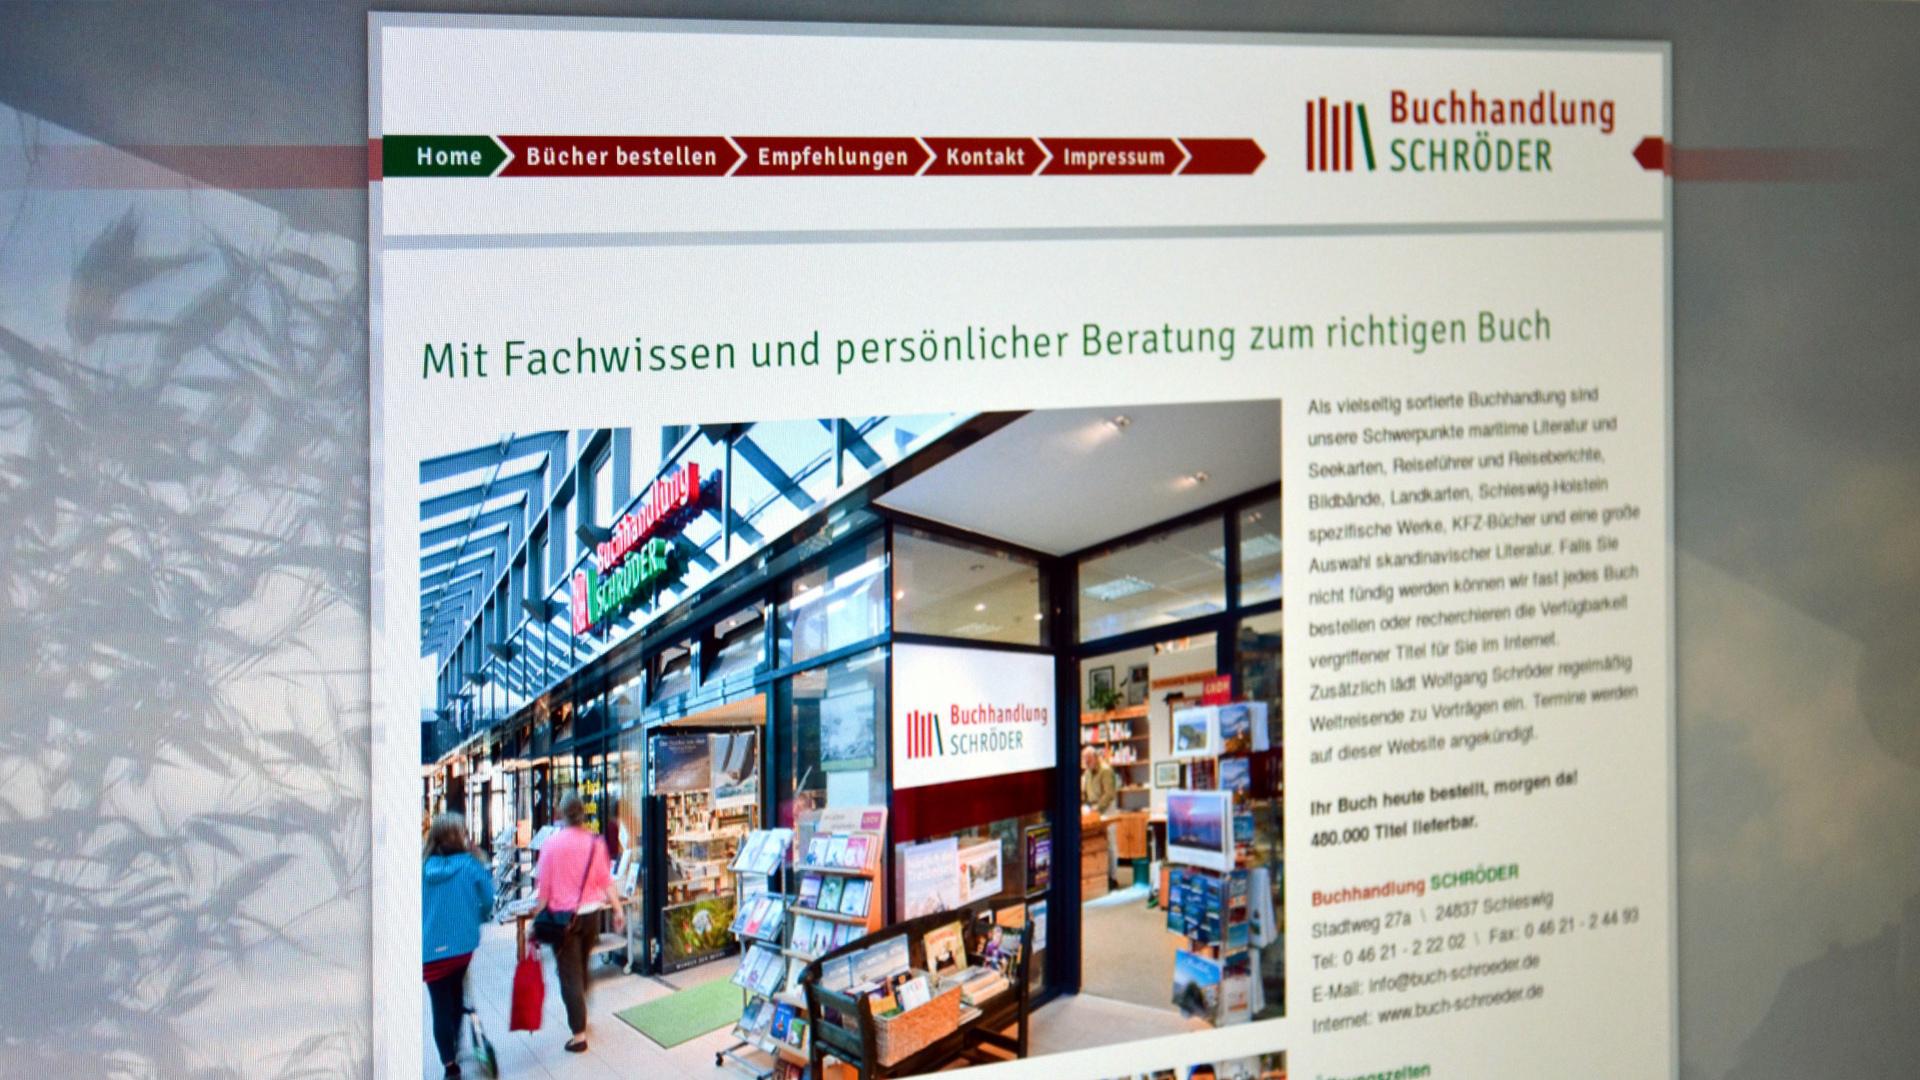 Buchhandlung Schröder